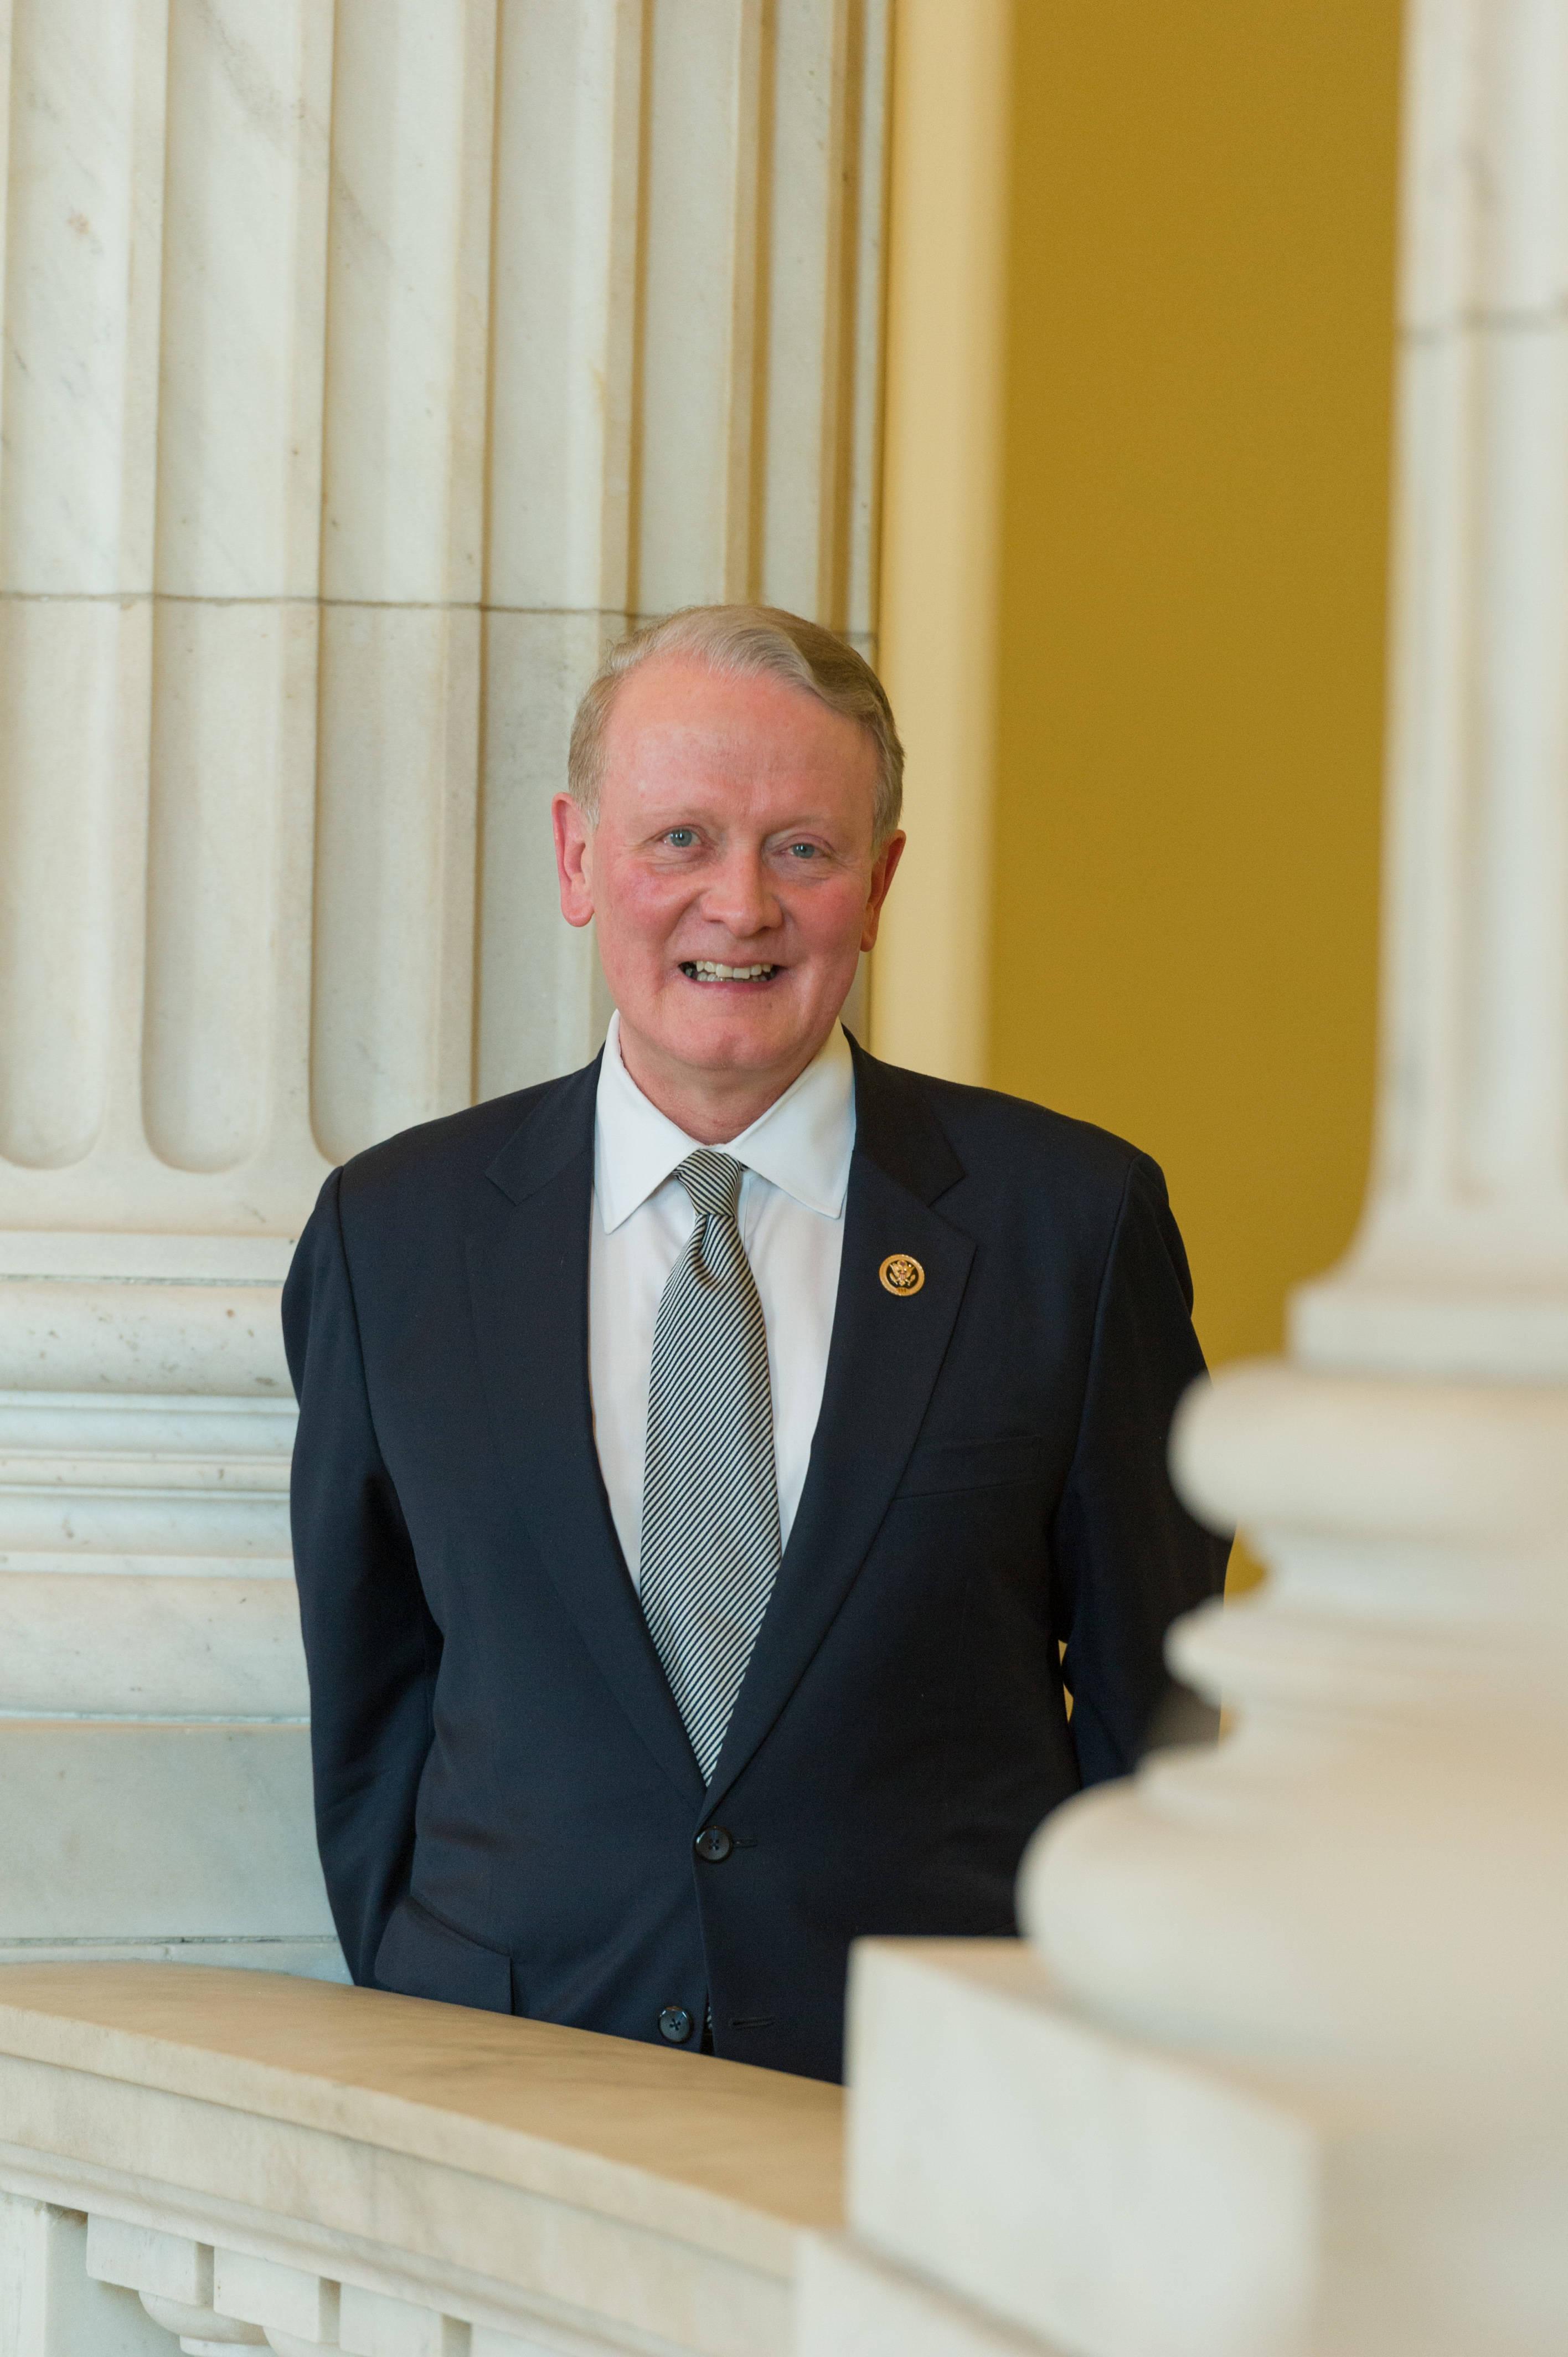 cce3fe909083a3fa022f_Congressman-Leonard-Lance_official-portrait.jpg